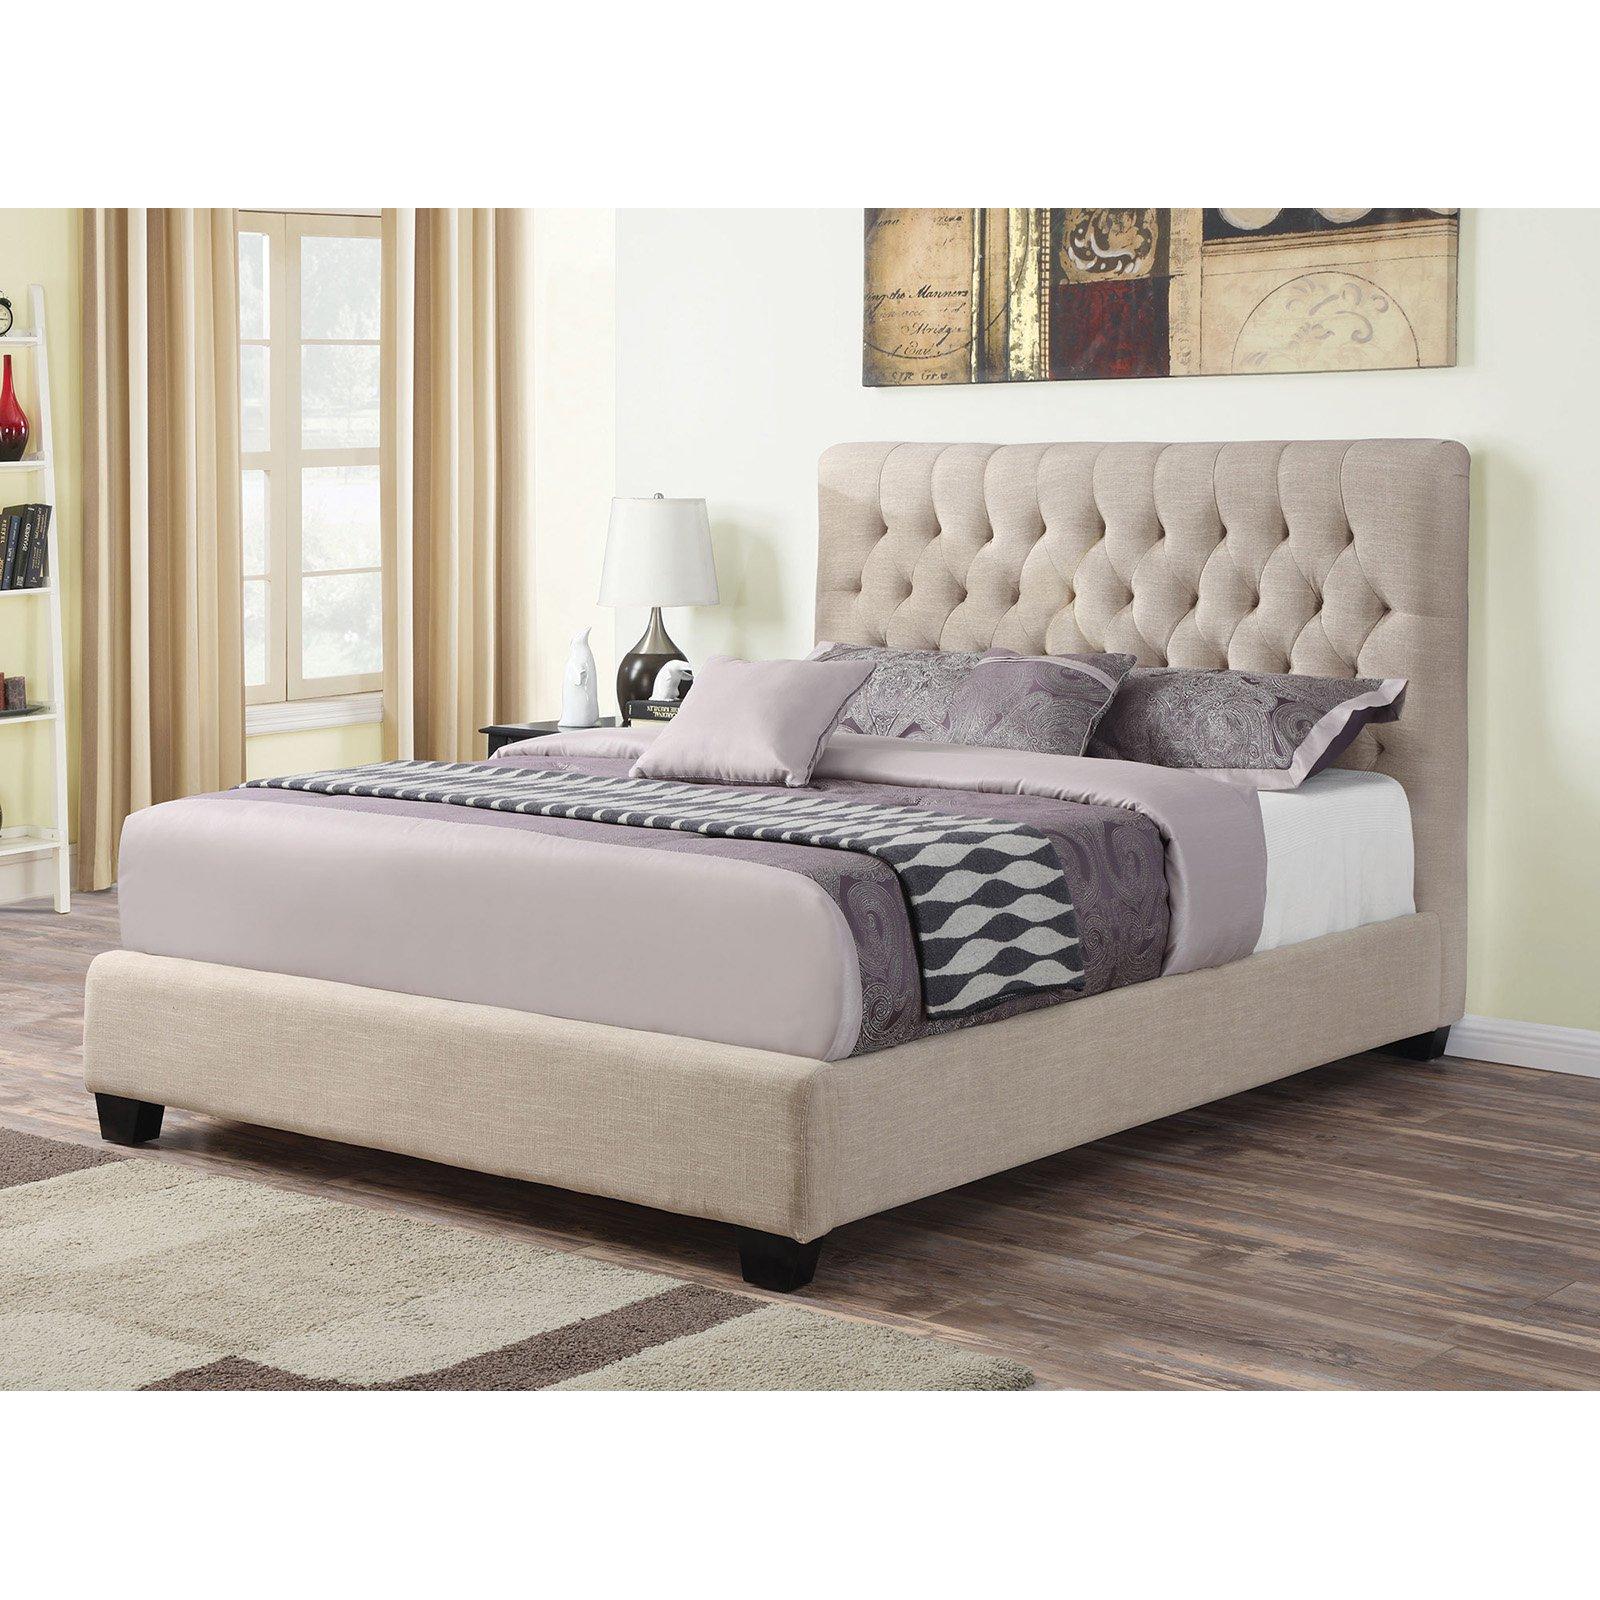 Coaster Furniture Coaster Chloe Upholstered Bed